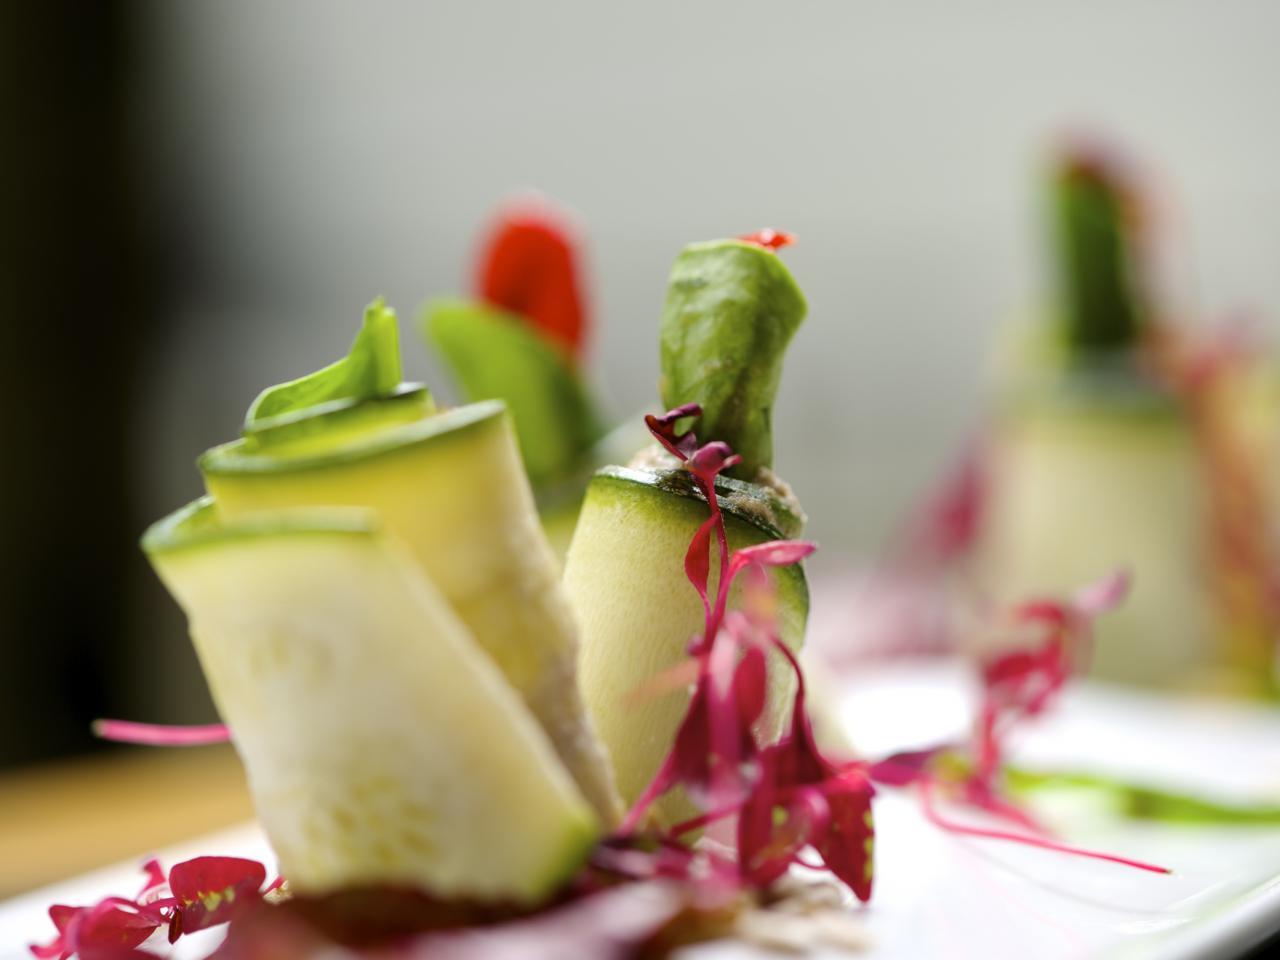 Веганское меню ресторана Nosh Garden Kitchen